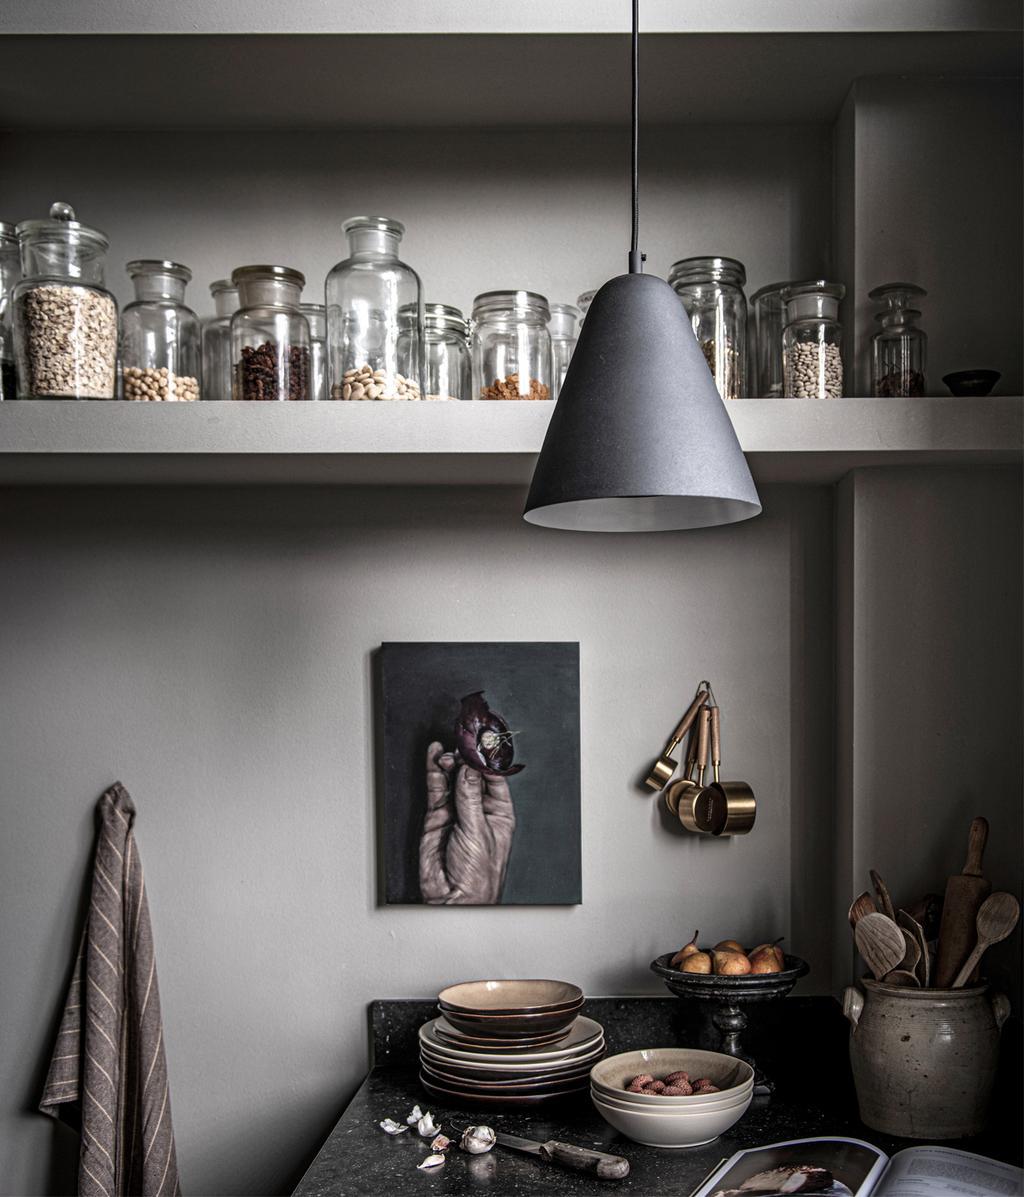 keuken | Light & Living hanglamp  | vtwonen 01-2021